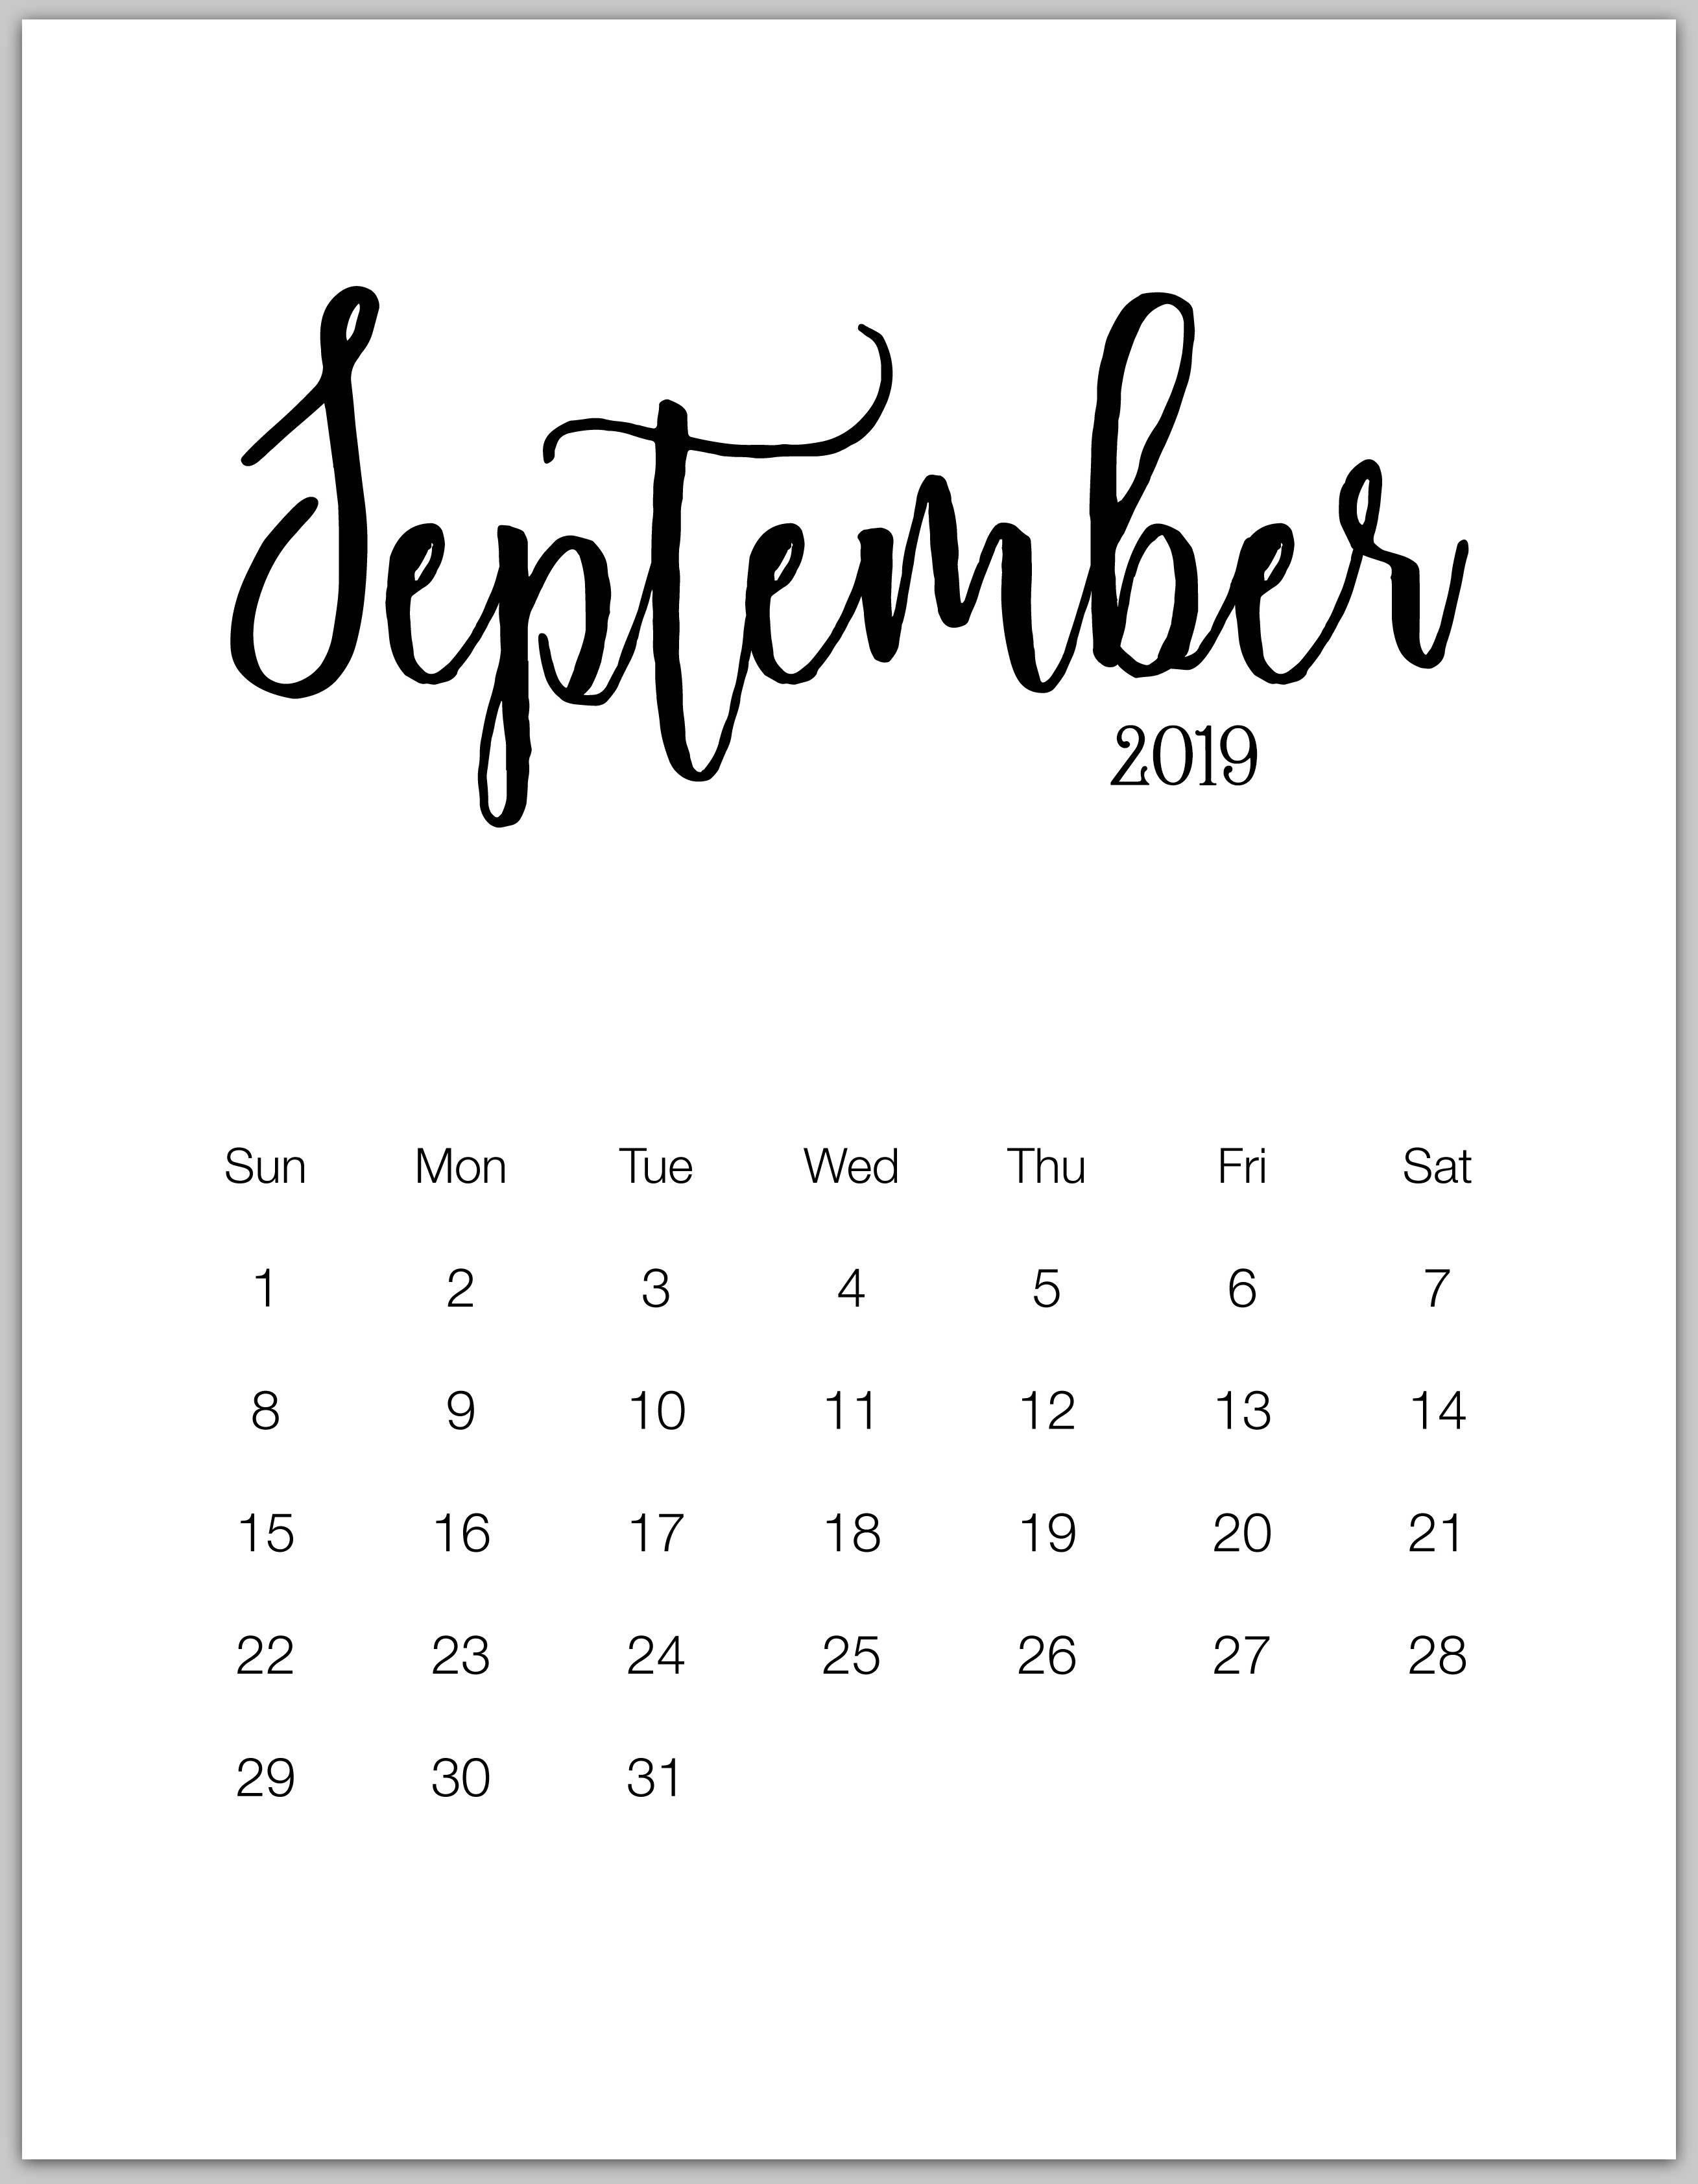 1 September 2019 To 31 December 2019 Calendar 2019 Minimalist Printable Calendar From January To December